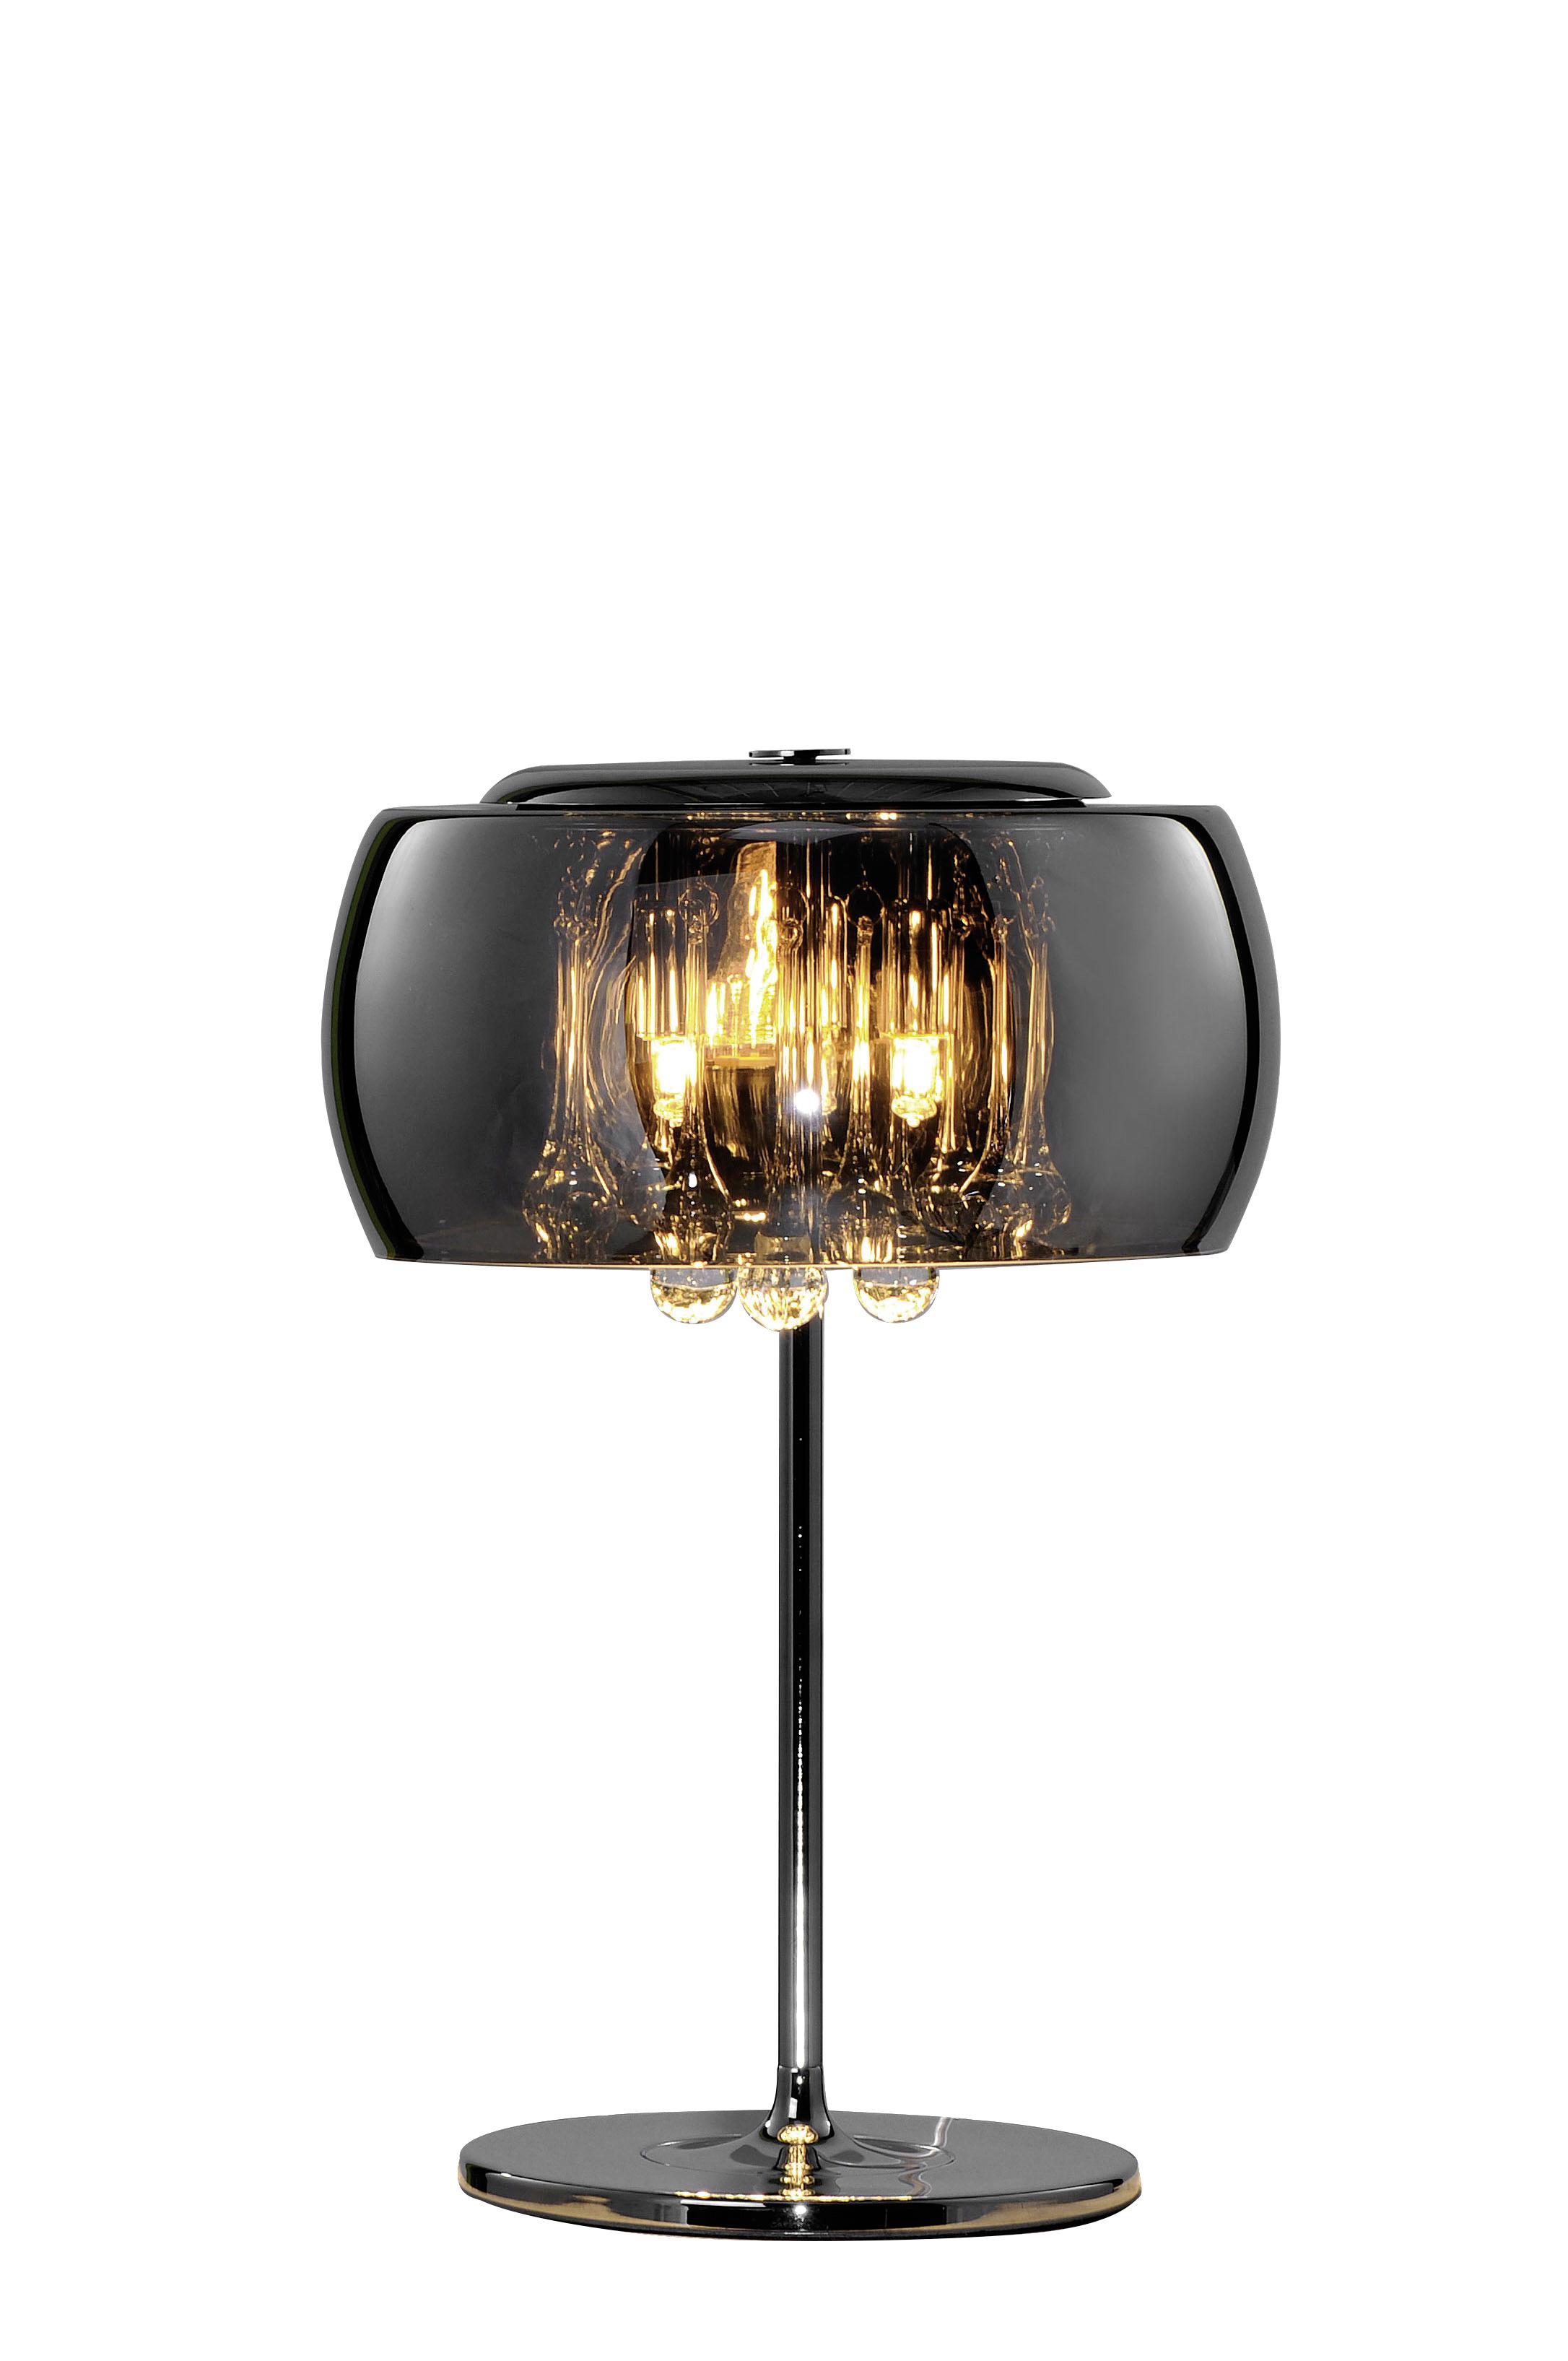 Trio Vapore asztali lámpa